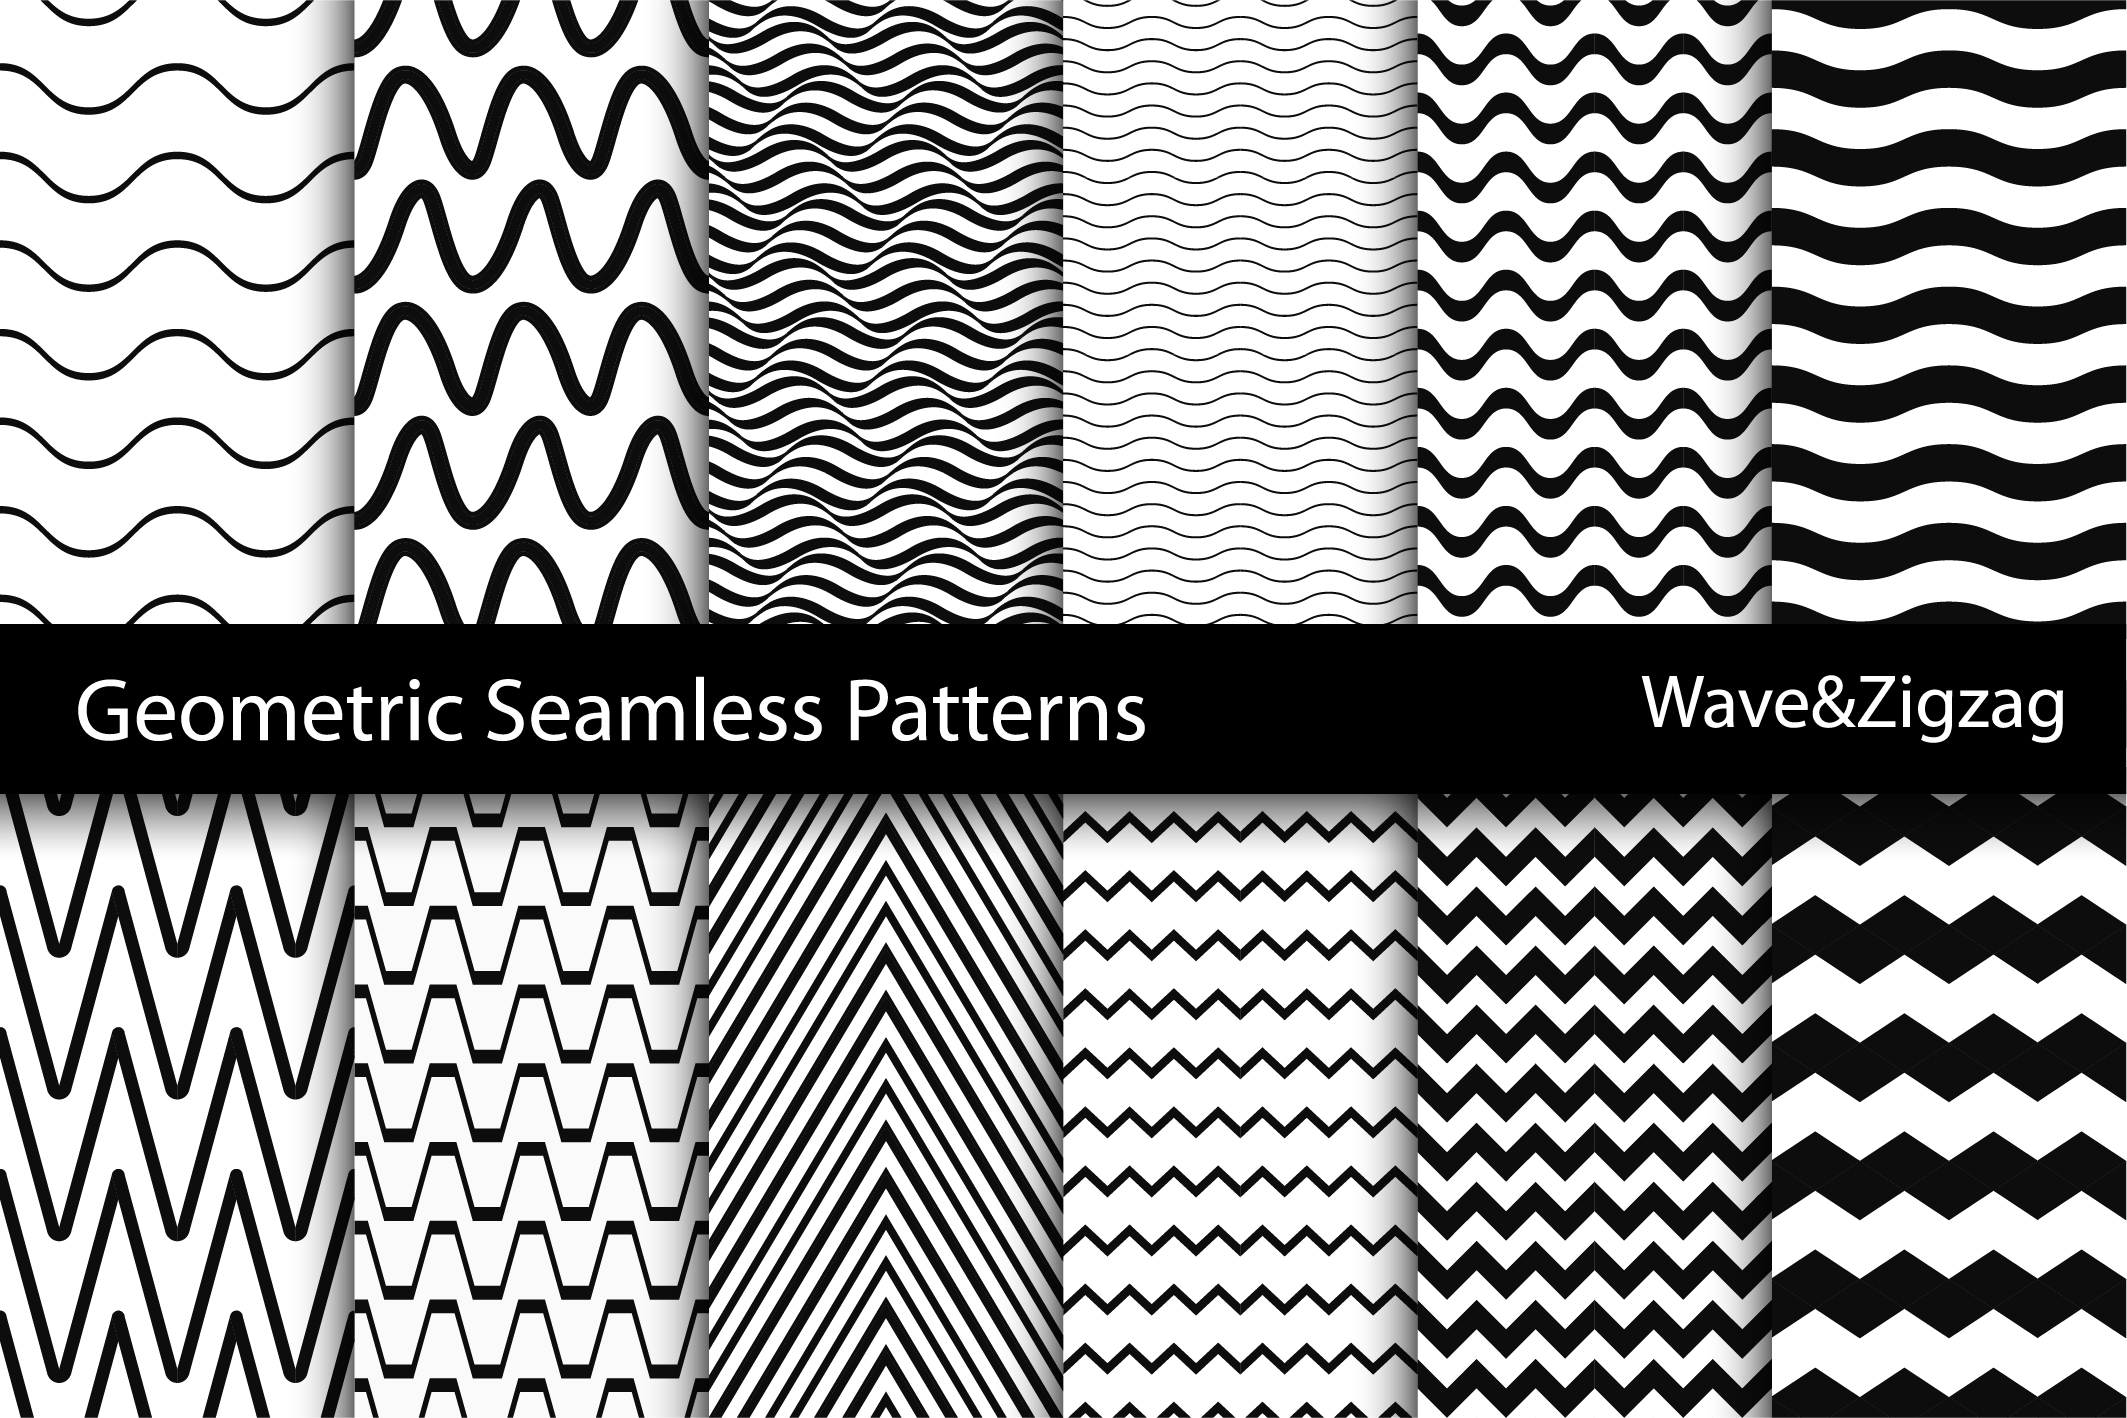 Wave&Zigzag seamless patterns. B&W. example image 1